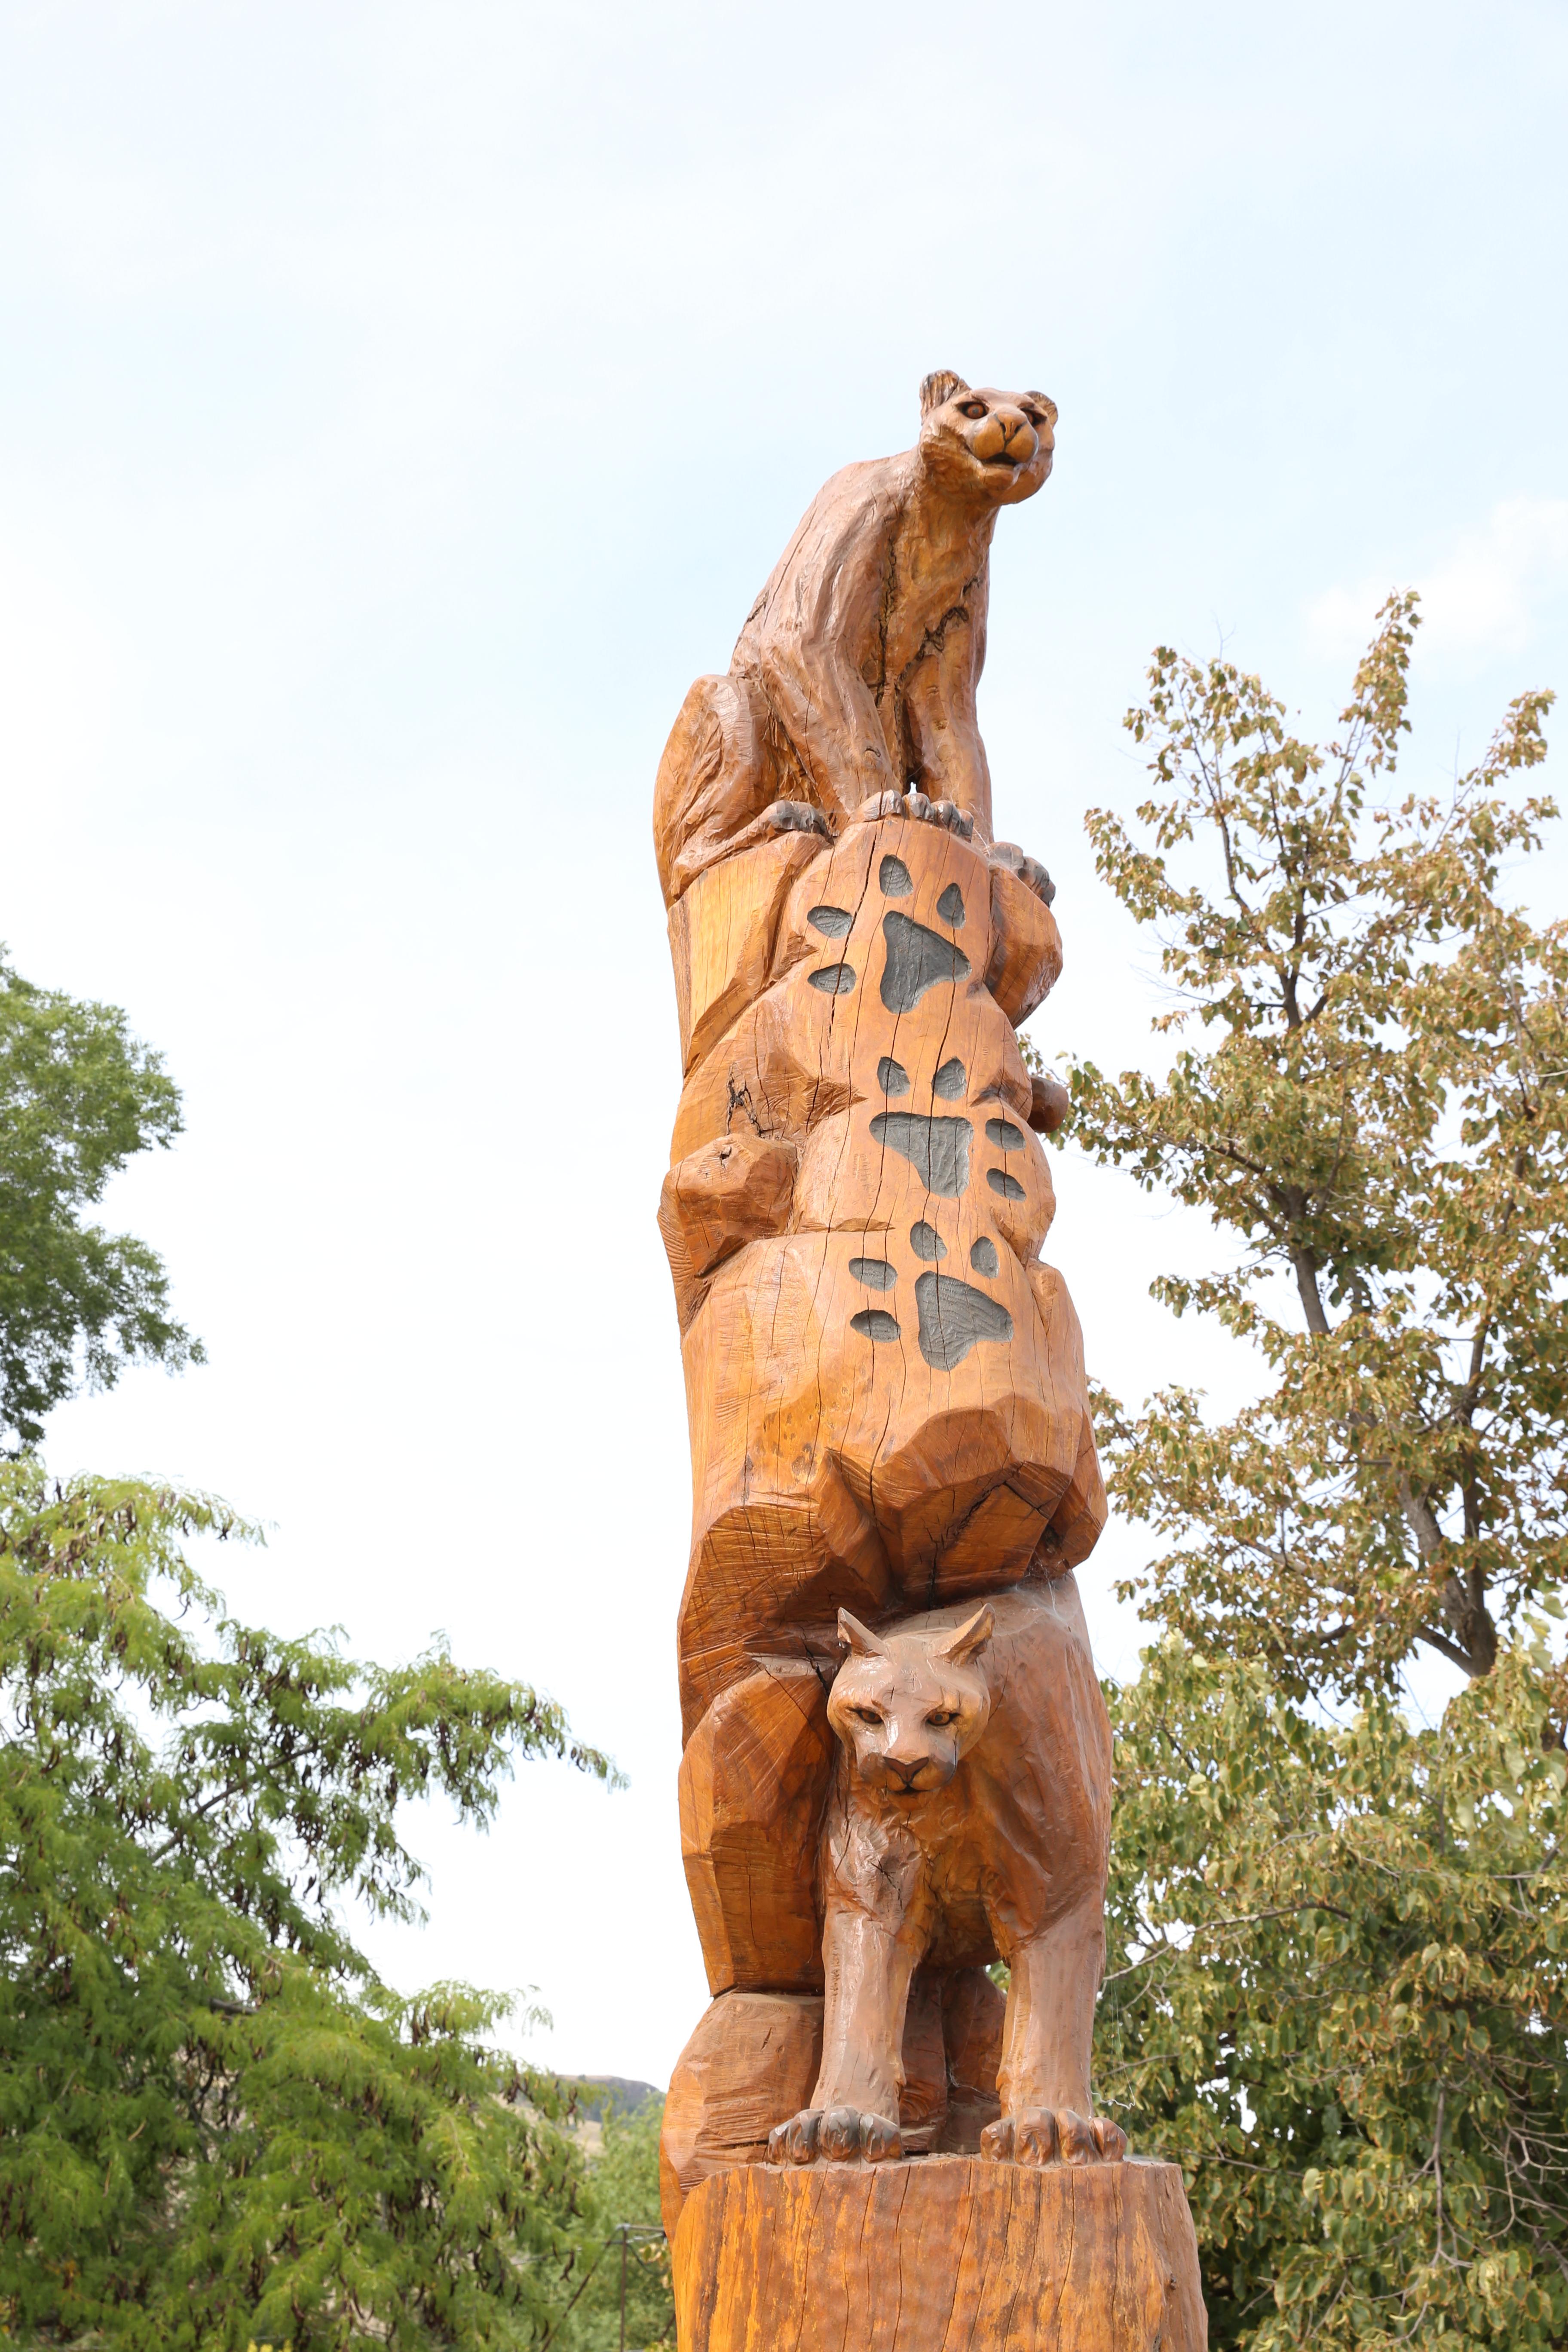 Chainsaw artist transforms trees into art u2013 ruth e. hendricks